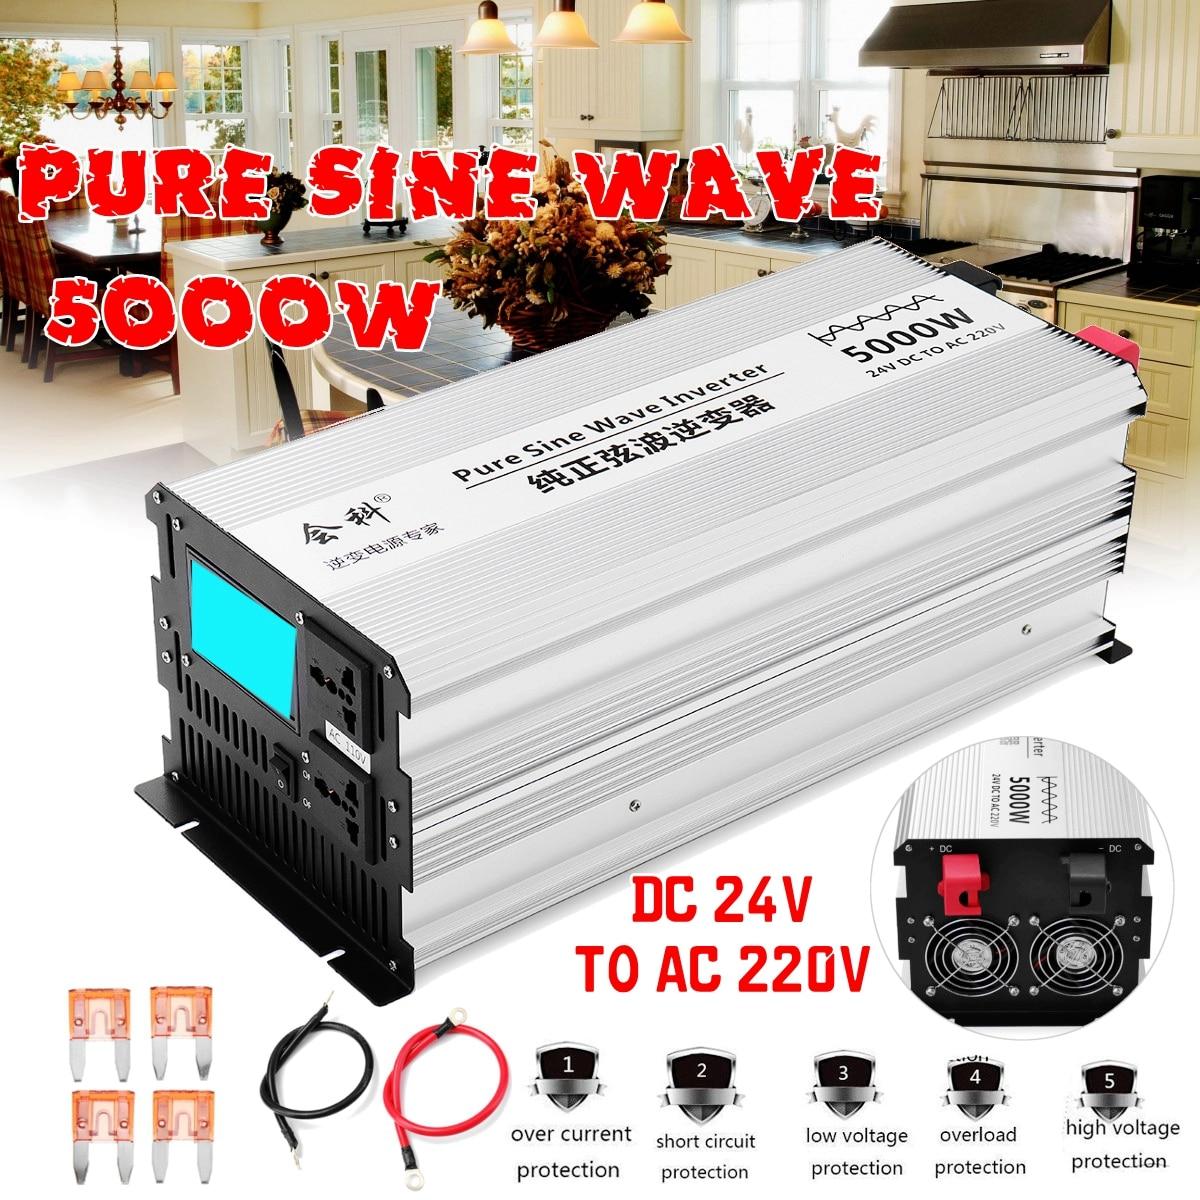 Inverter onda sinusoidale pura 2500 w 5000 w di Picco 50 hz DC 12 v/24 v/48 v per AC 110 v/220 v di Tensione Trasformatore Converte display A LED Inverter